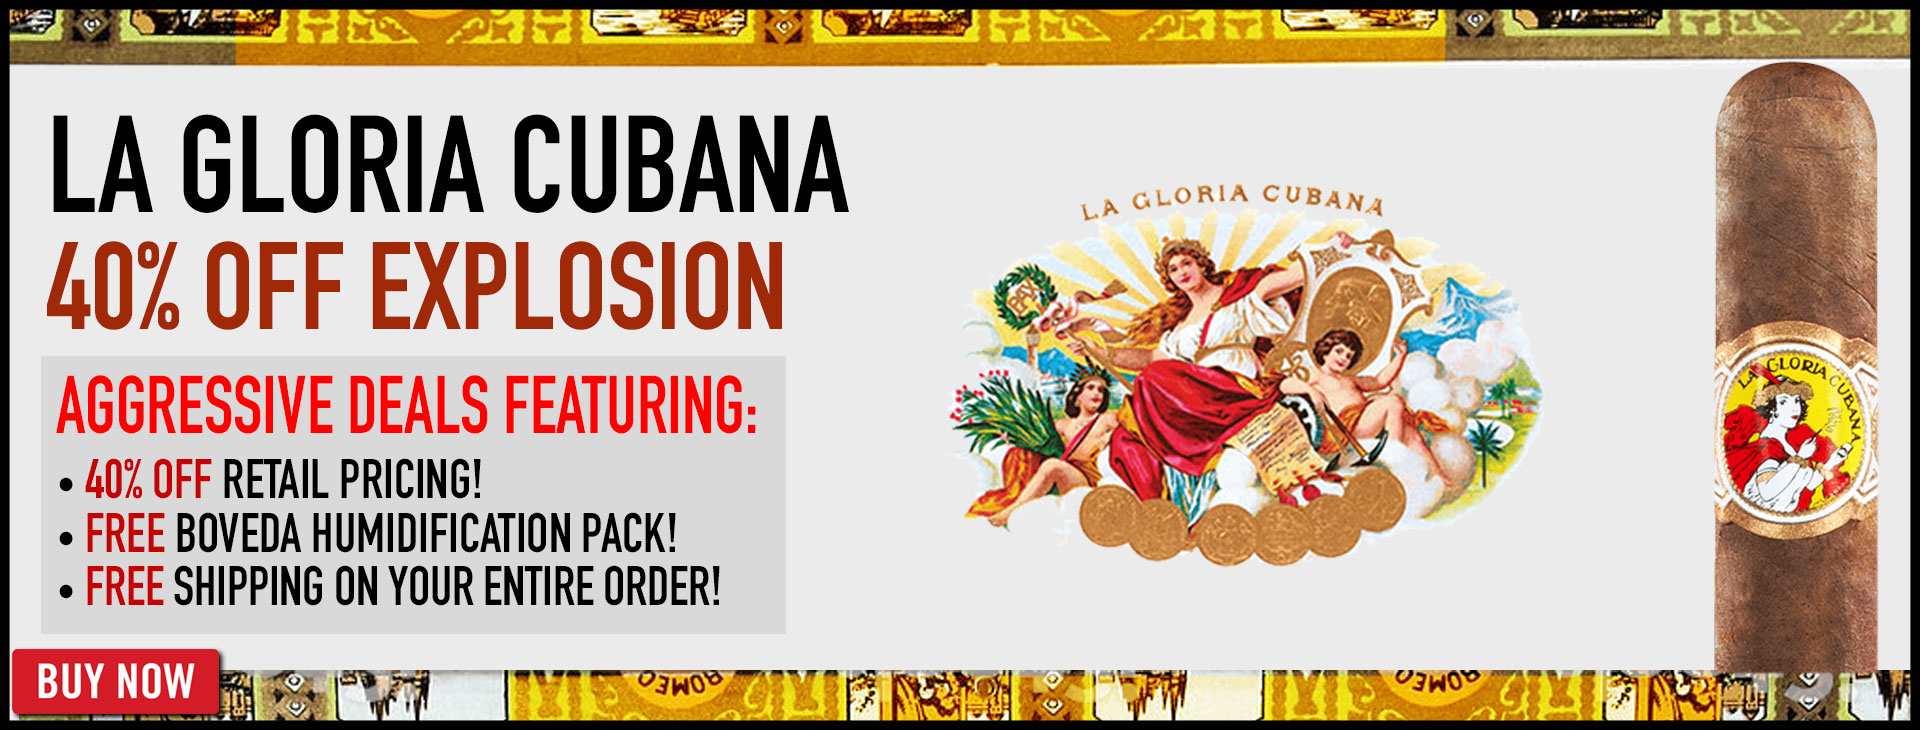 la-gloria-cubana-40-off-2020-banner.jpg